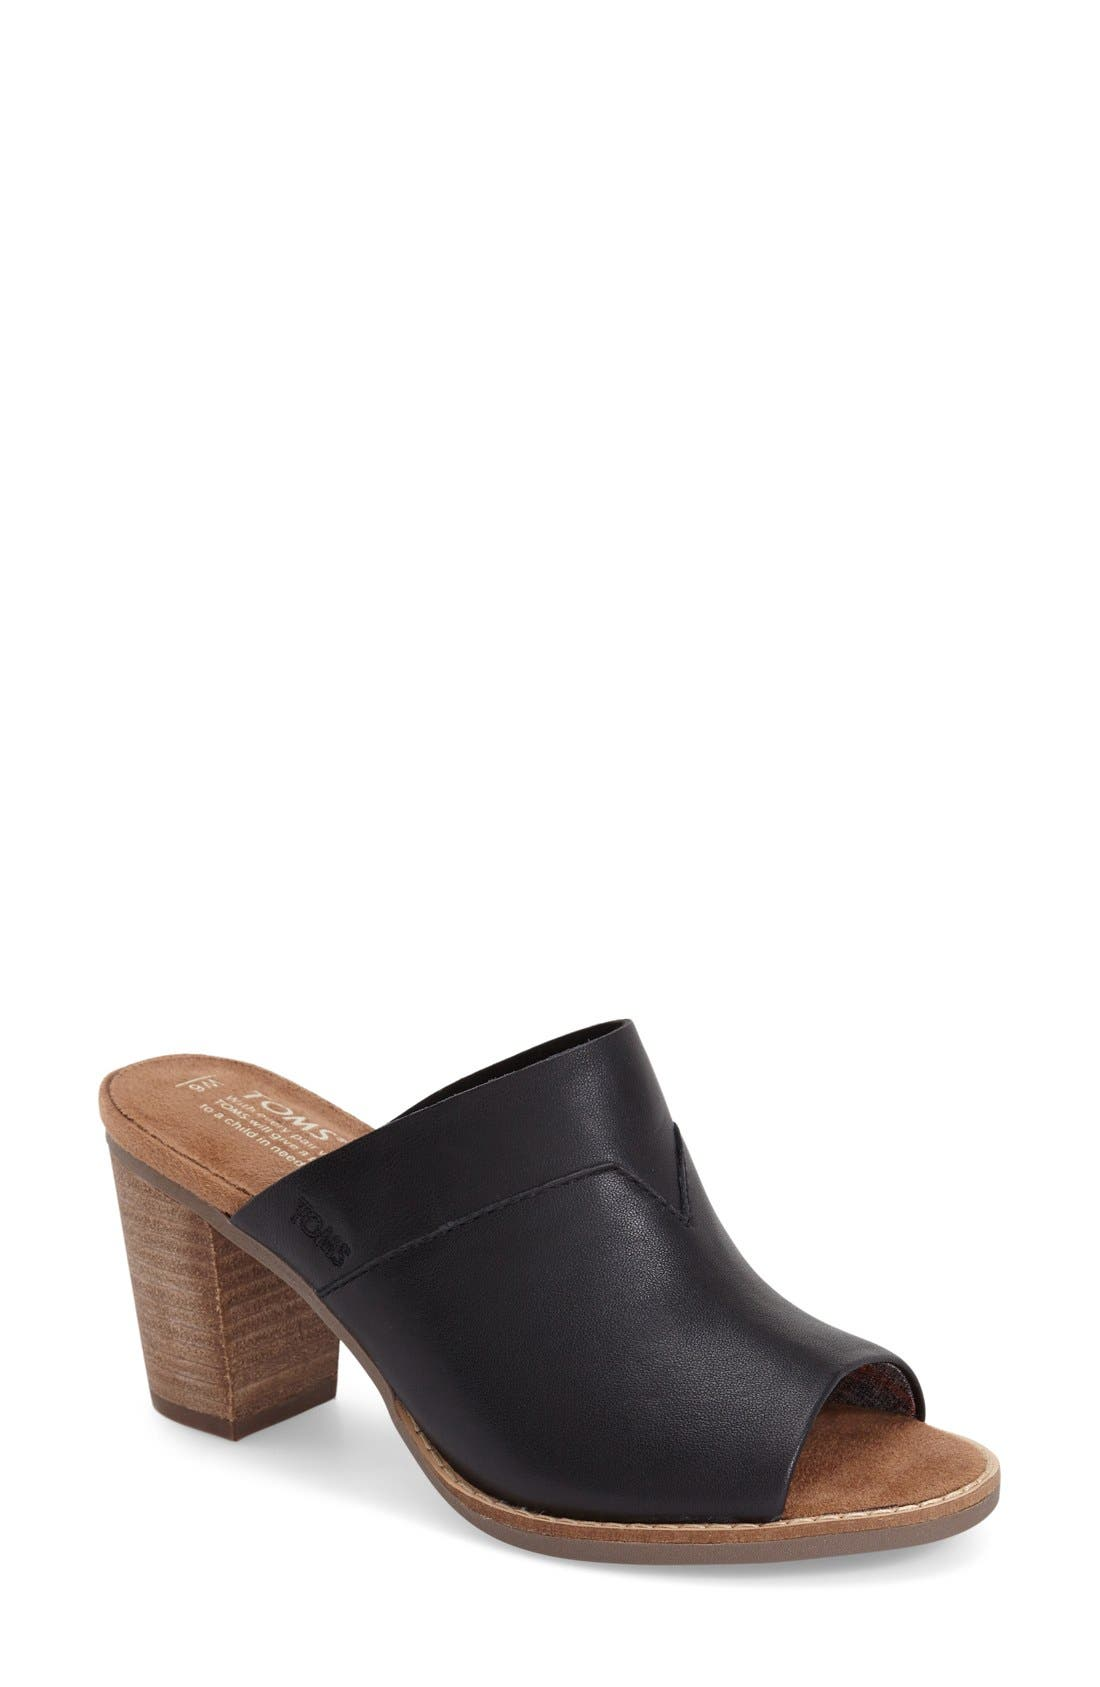 'Majorca' Mule Sandal,                             Main thumbnail 1, color,                             001